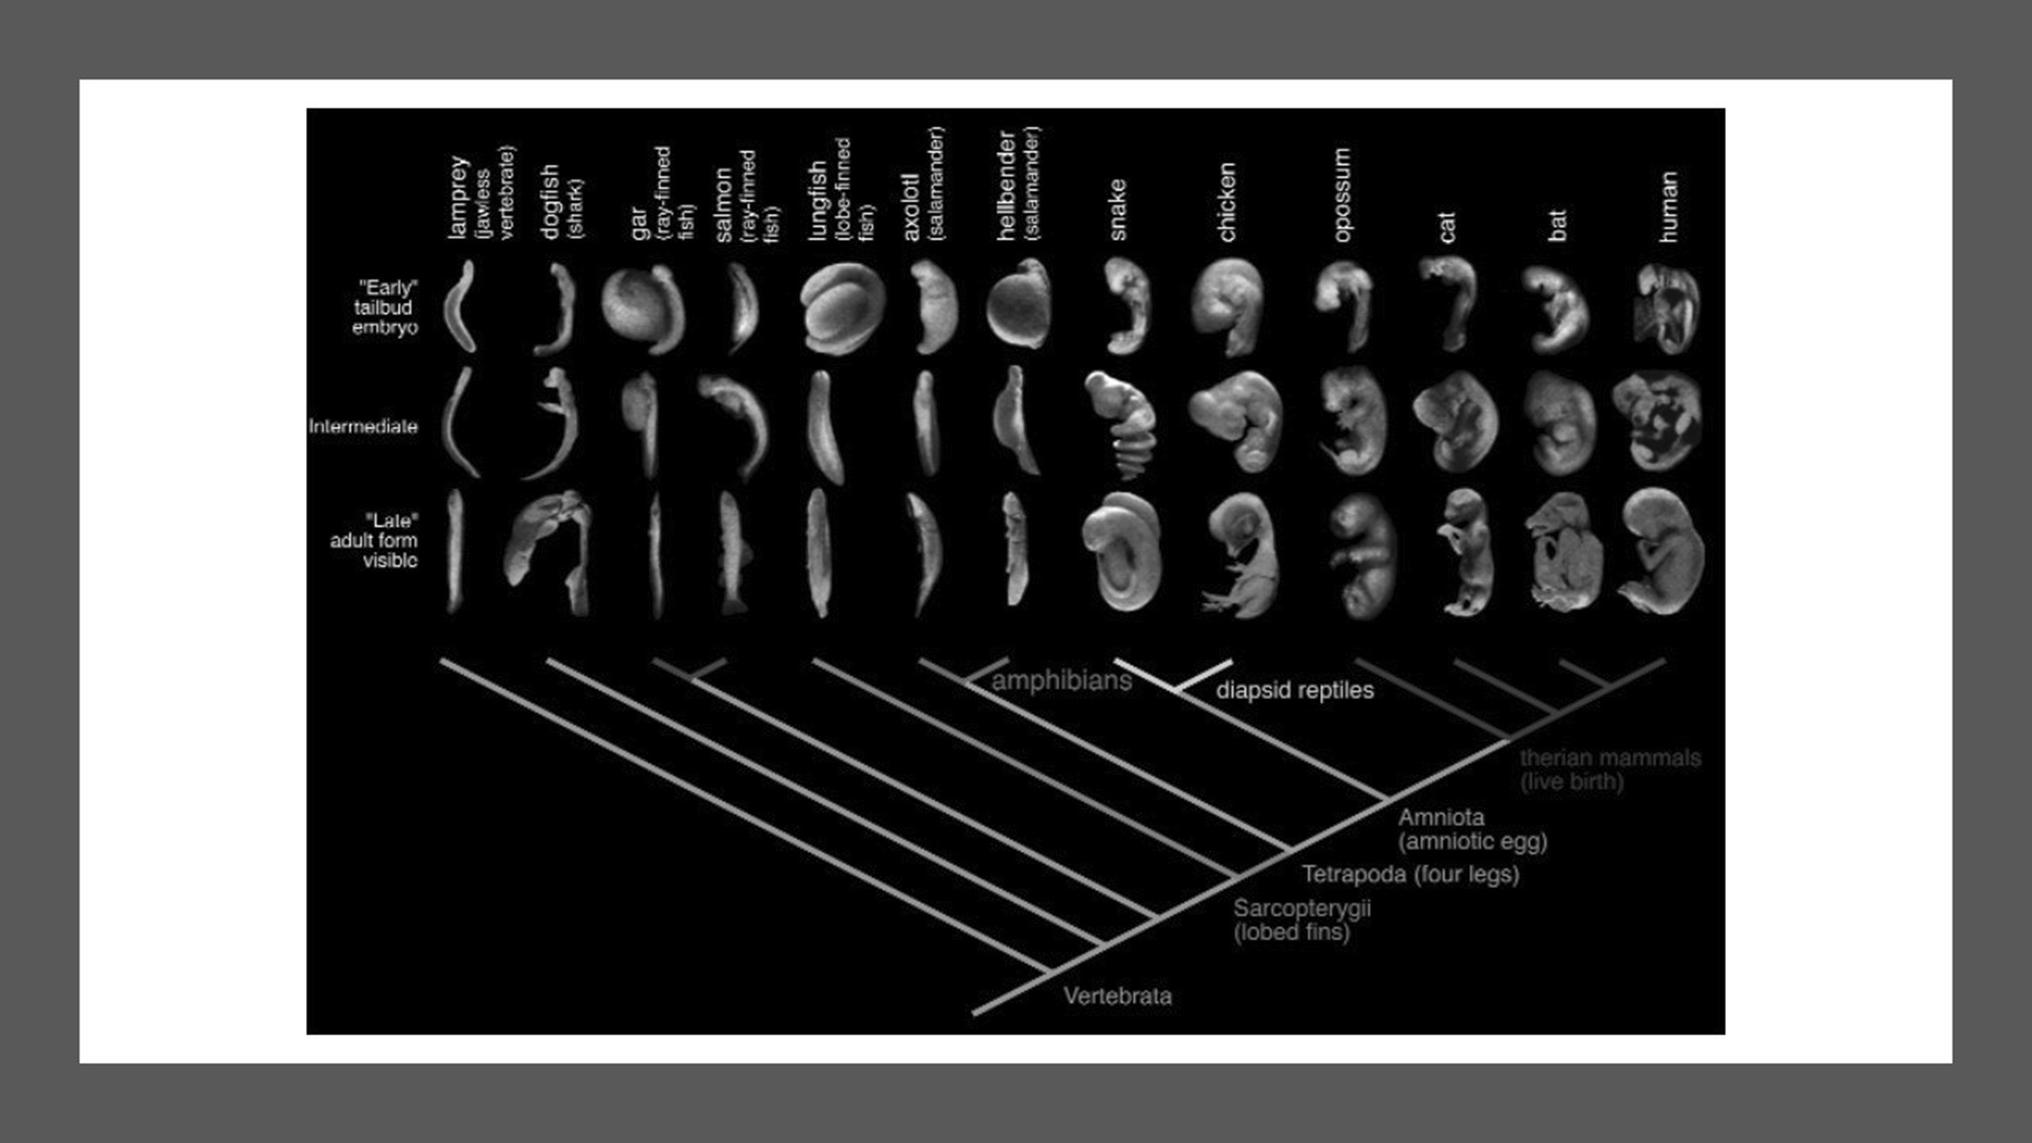 Ernst Haeckel's contribution to Evo-Devo and scientific